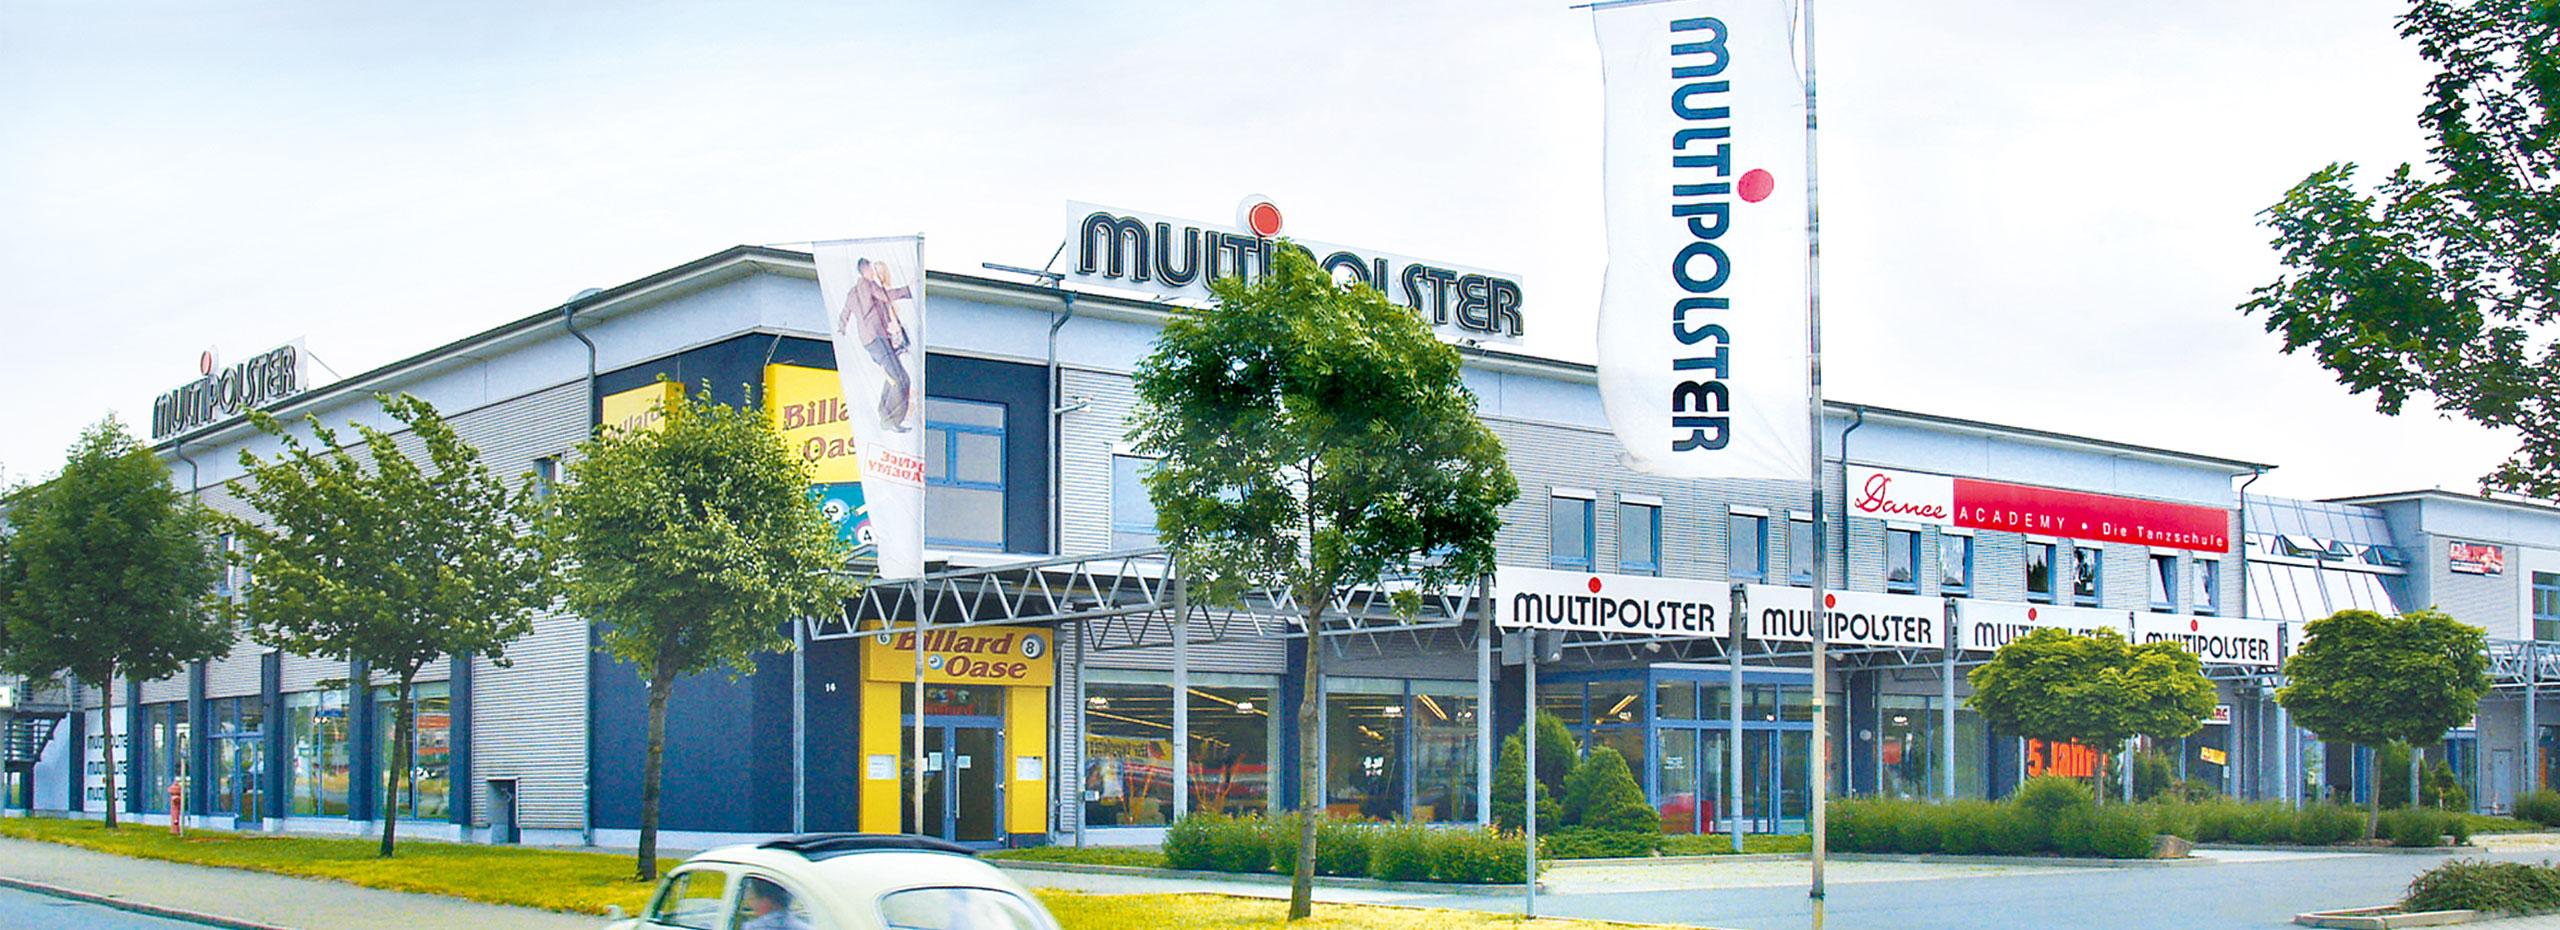 Multipolster - Zwickau